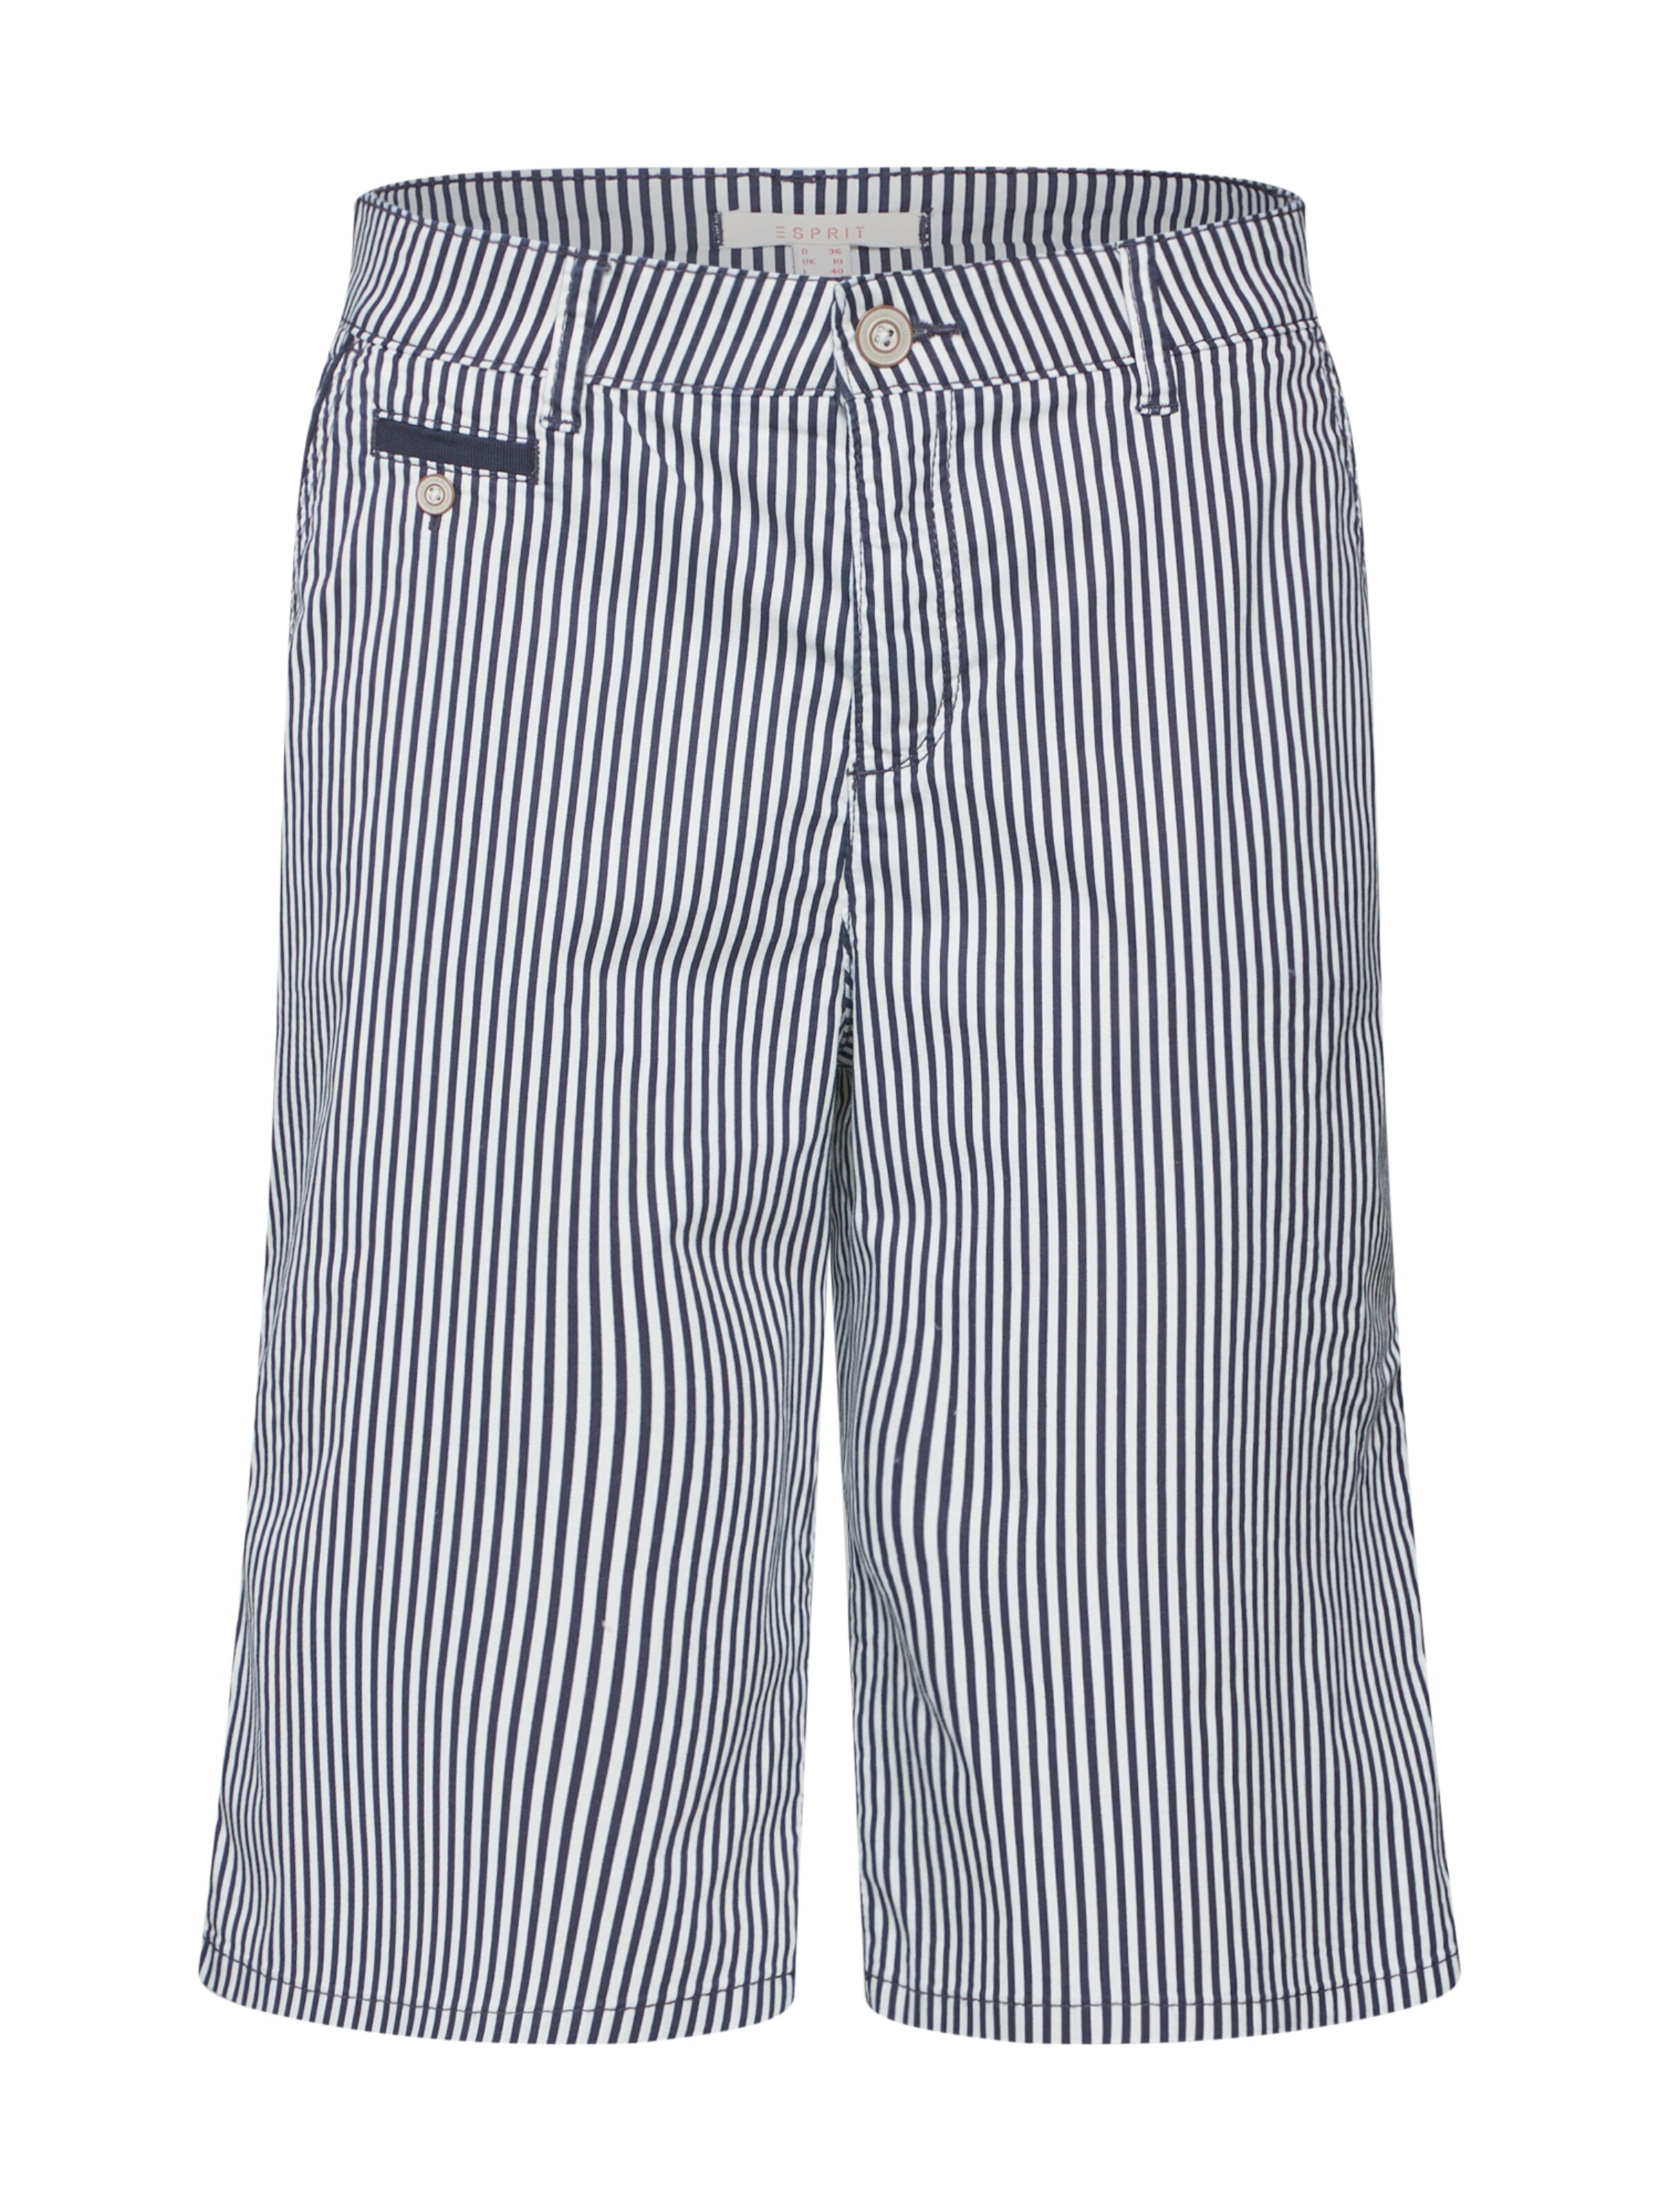 En Pantalon Esprit Bleu Bleu Marine Esprit En Pantalon Esprit Marine thdrxQsC